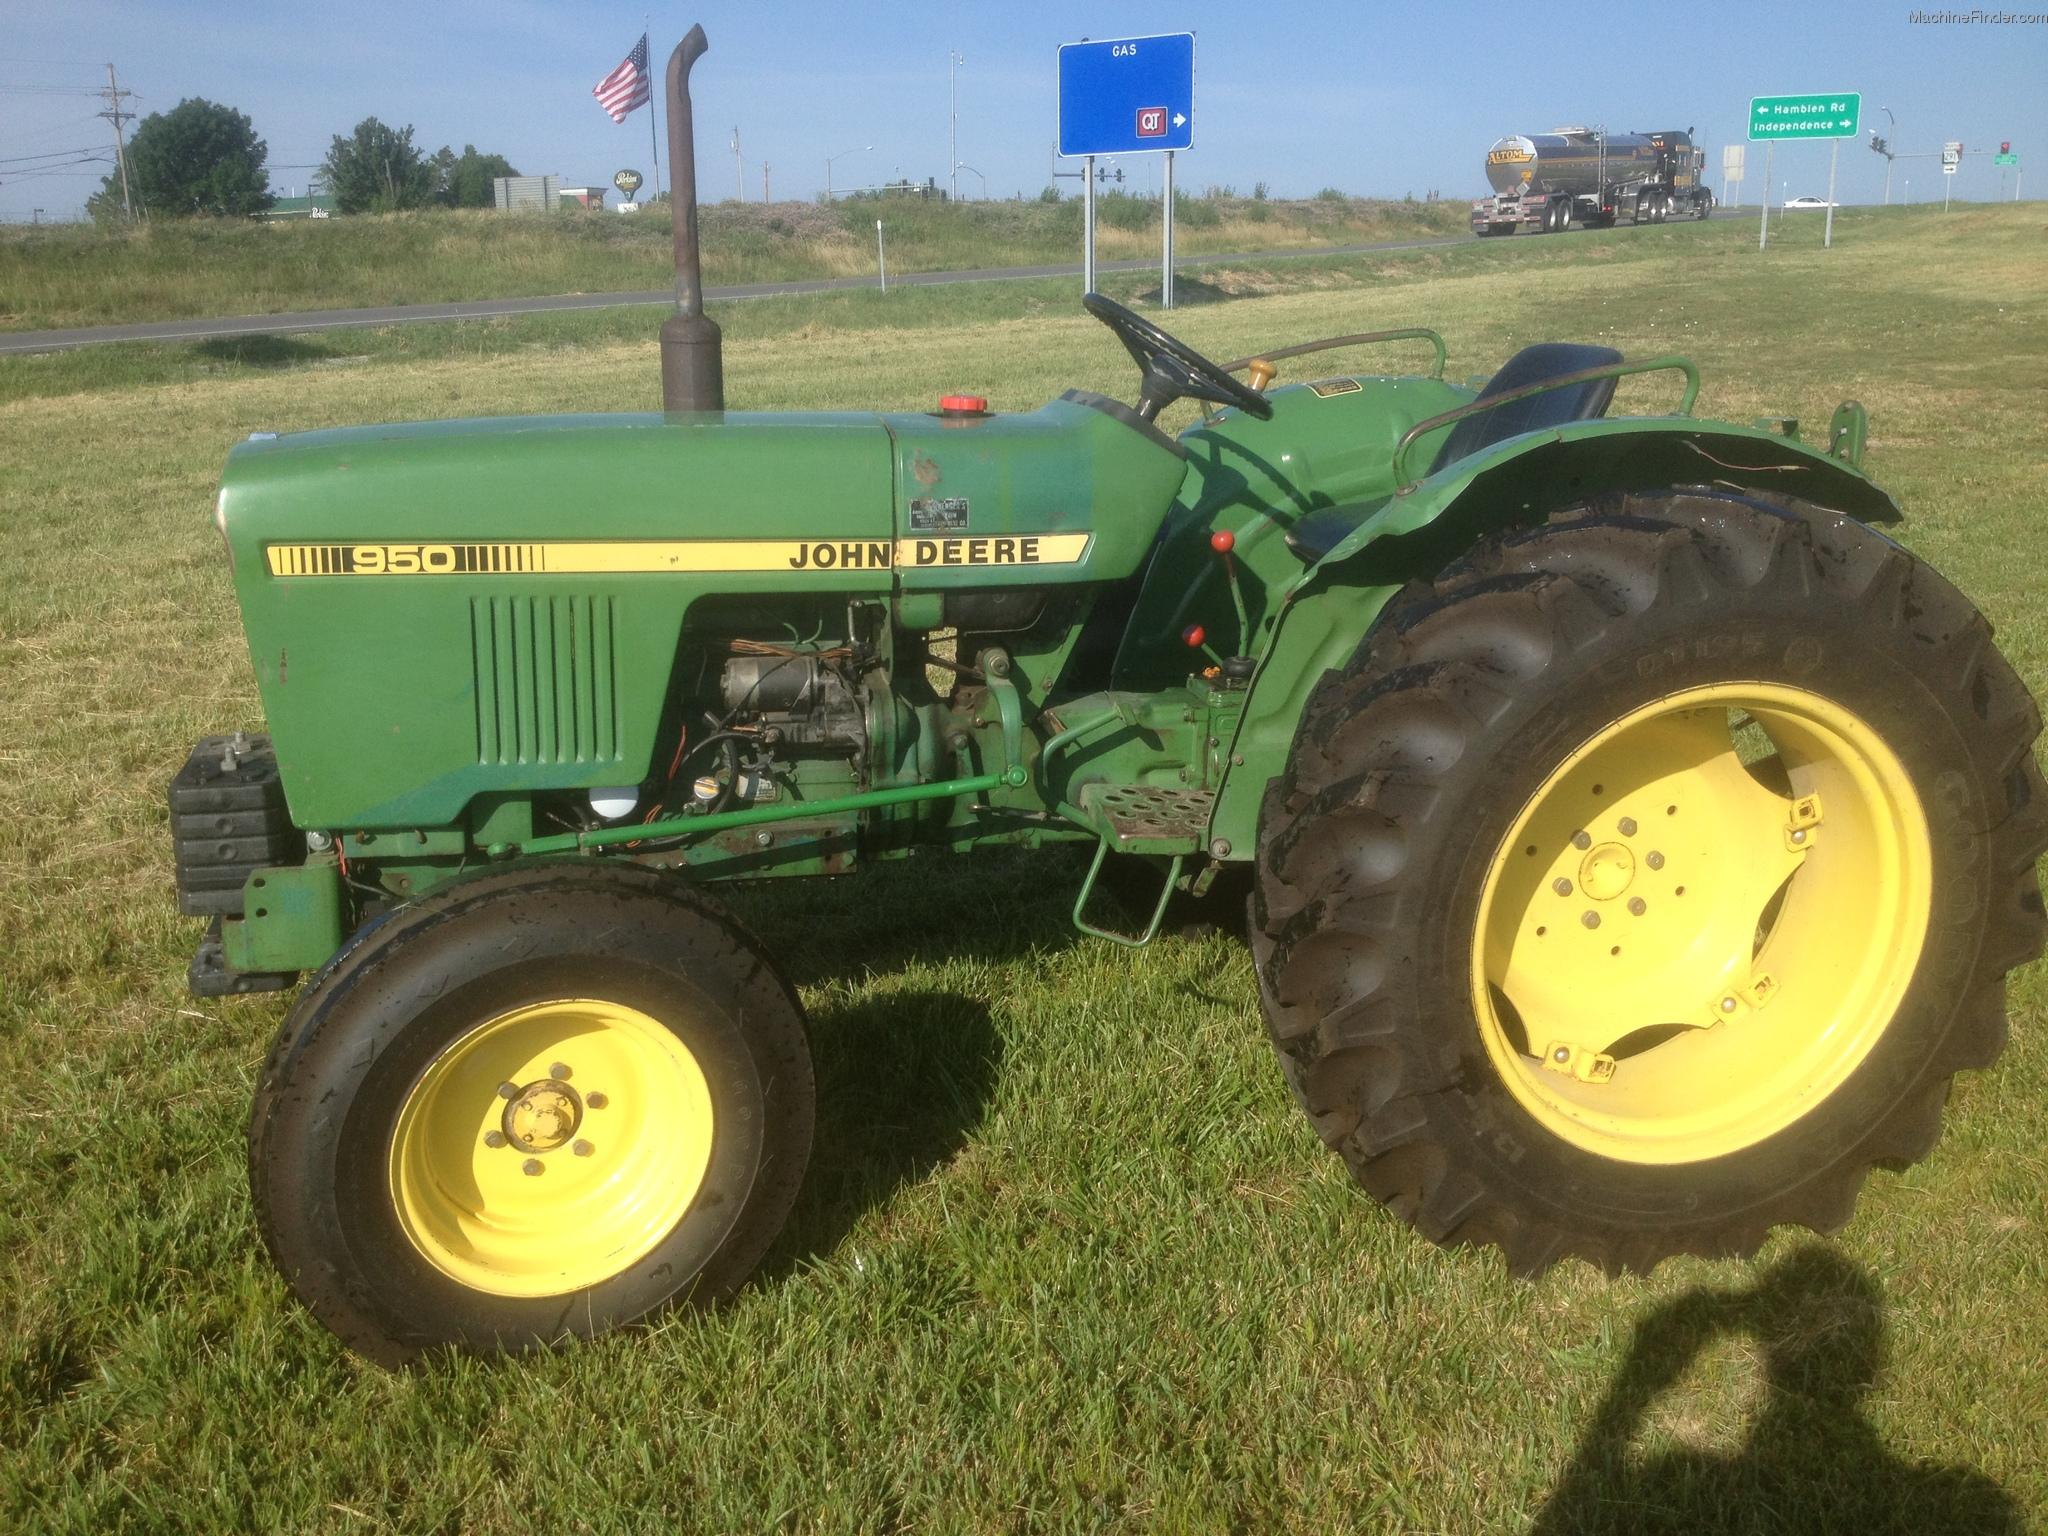 1982 John Deere 950 Tractors - Compact (1-40hp.) - John ...